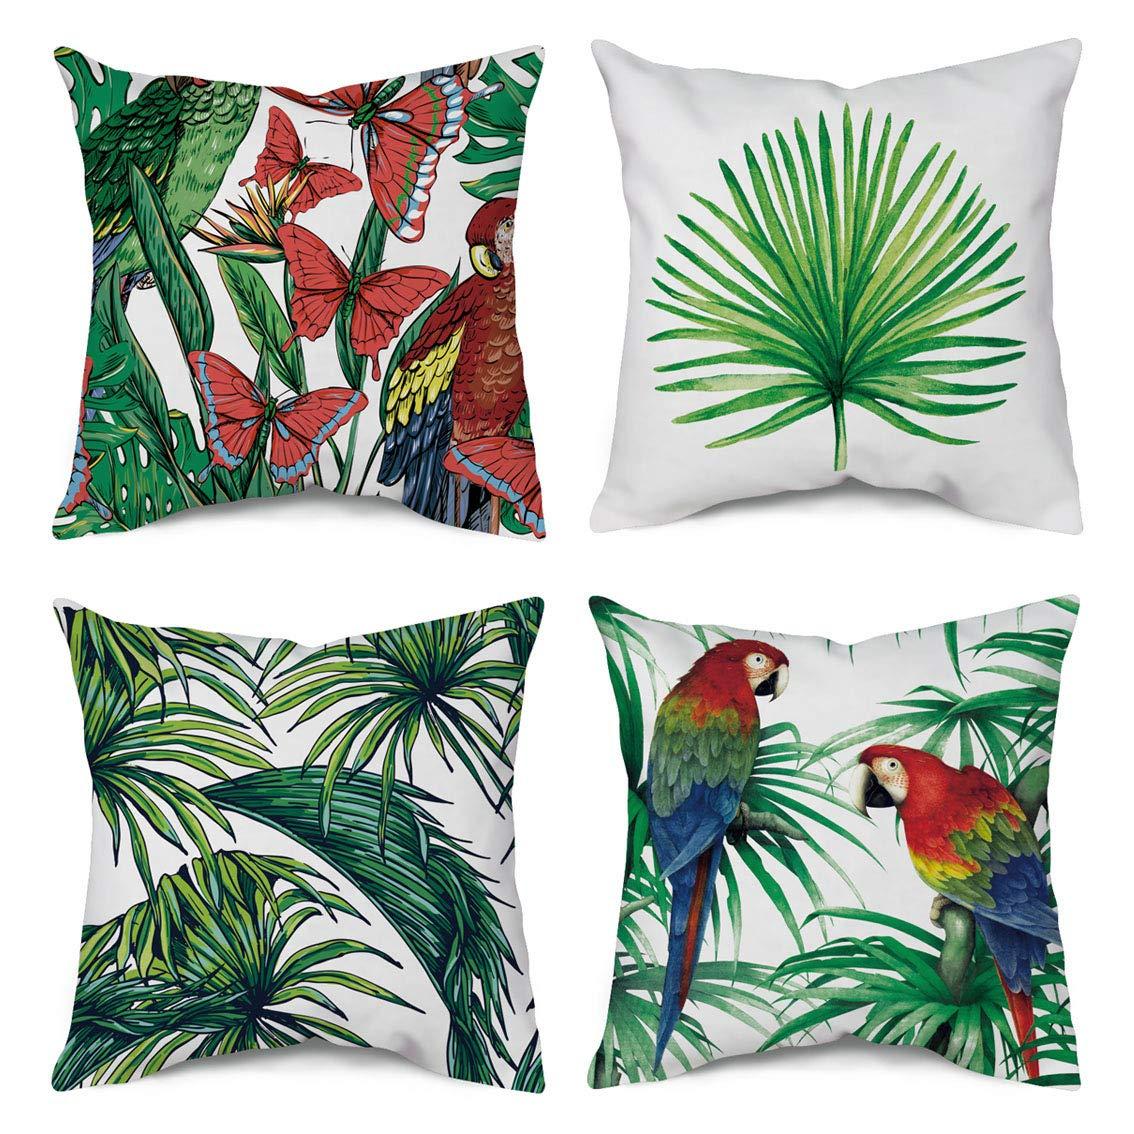 wendana plam bird butterfly decorative throw pillow cover 18x18 inch home decor garden outdoor pillow cushion cases for couch sofa bed patio set